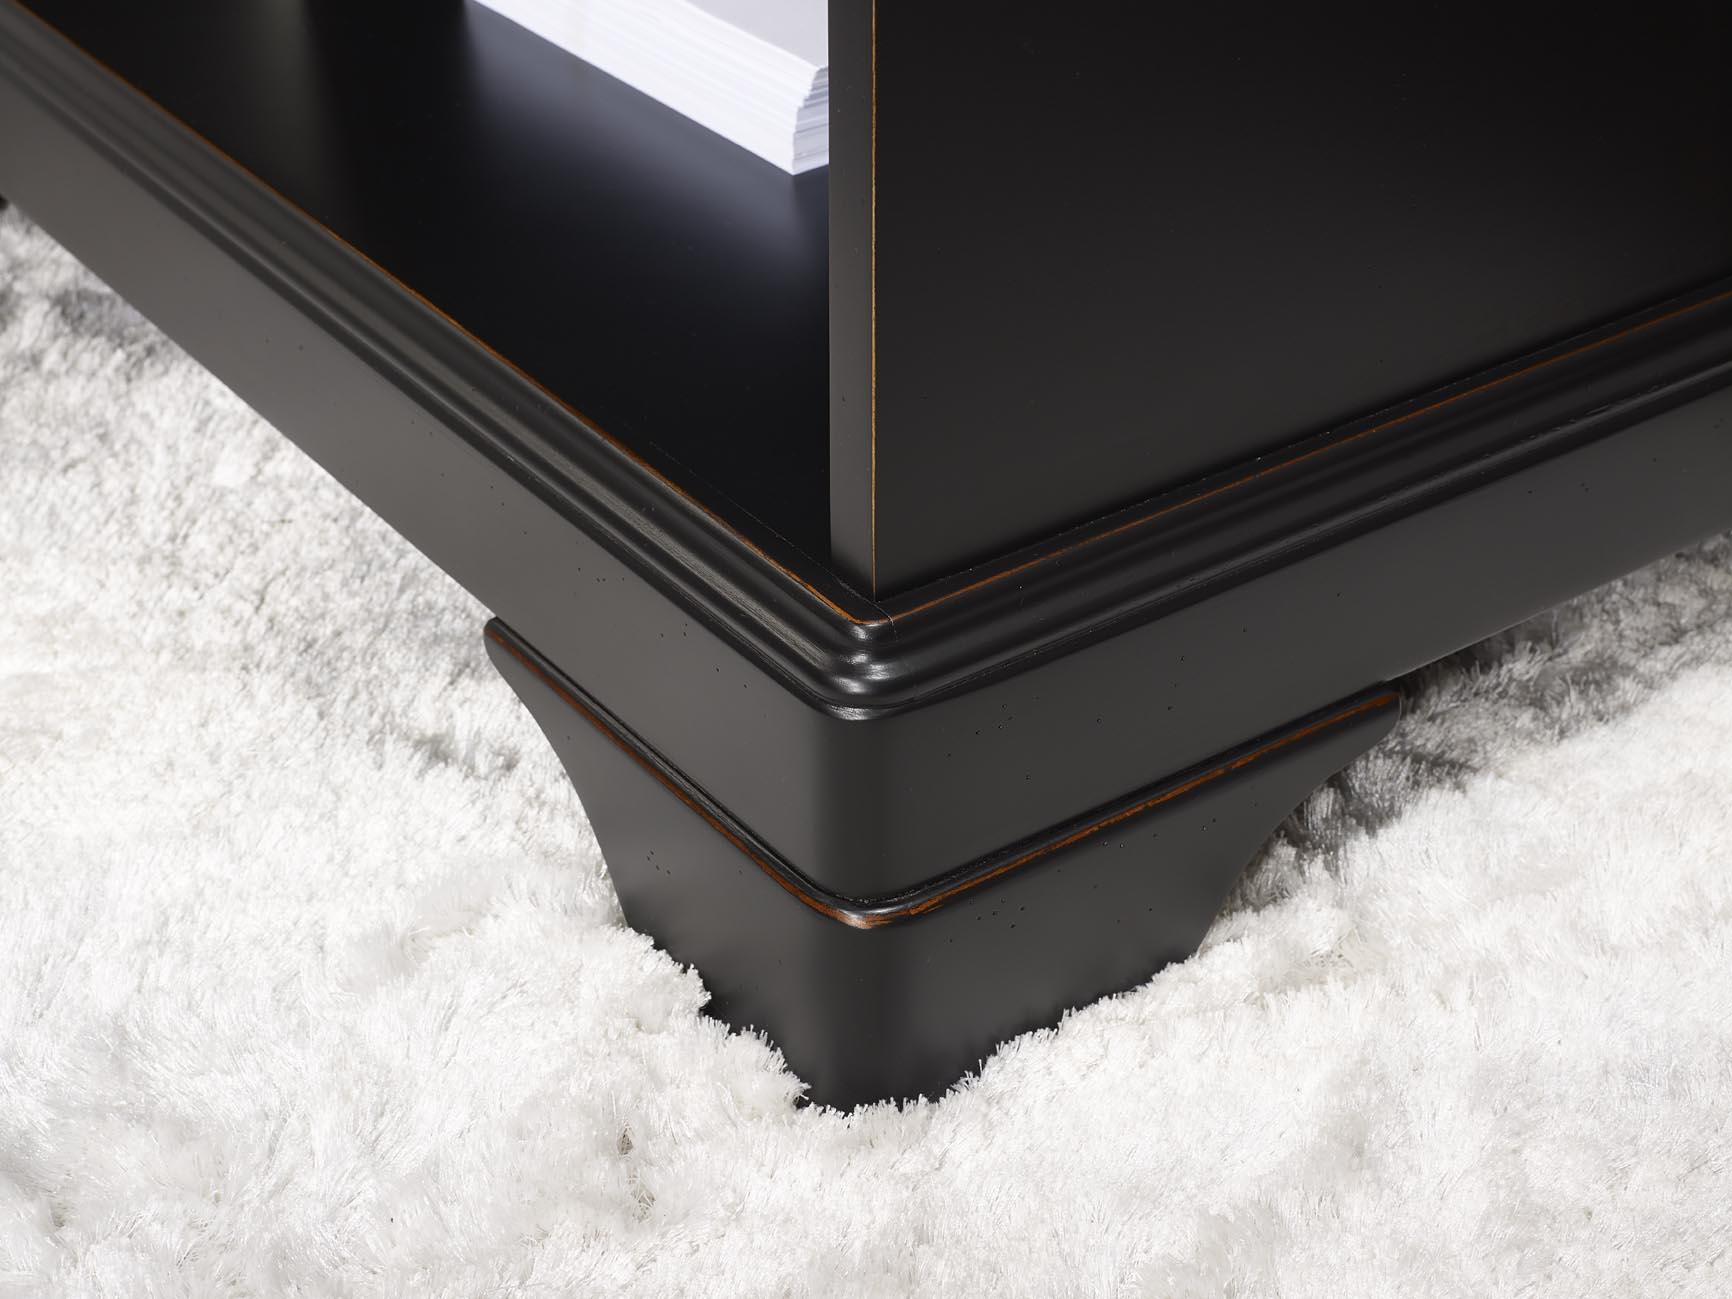 Meuble bureau noir meubles laqus noir et gris with meuble for Meuble bureau nice